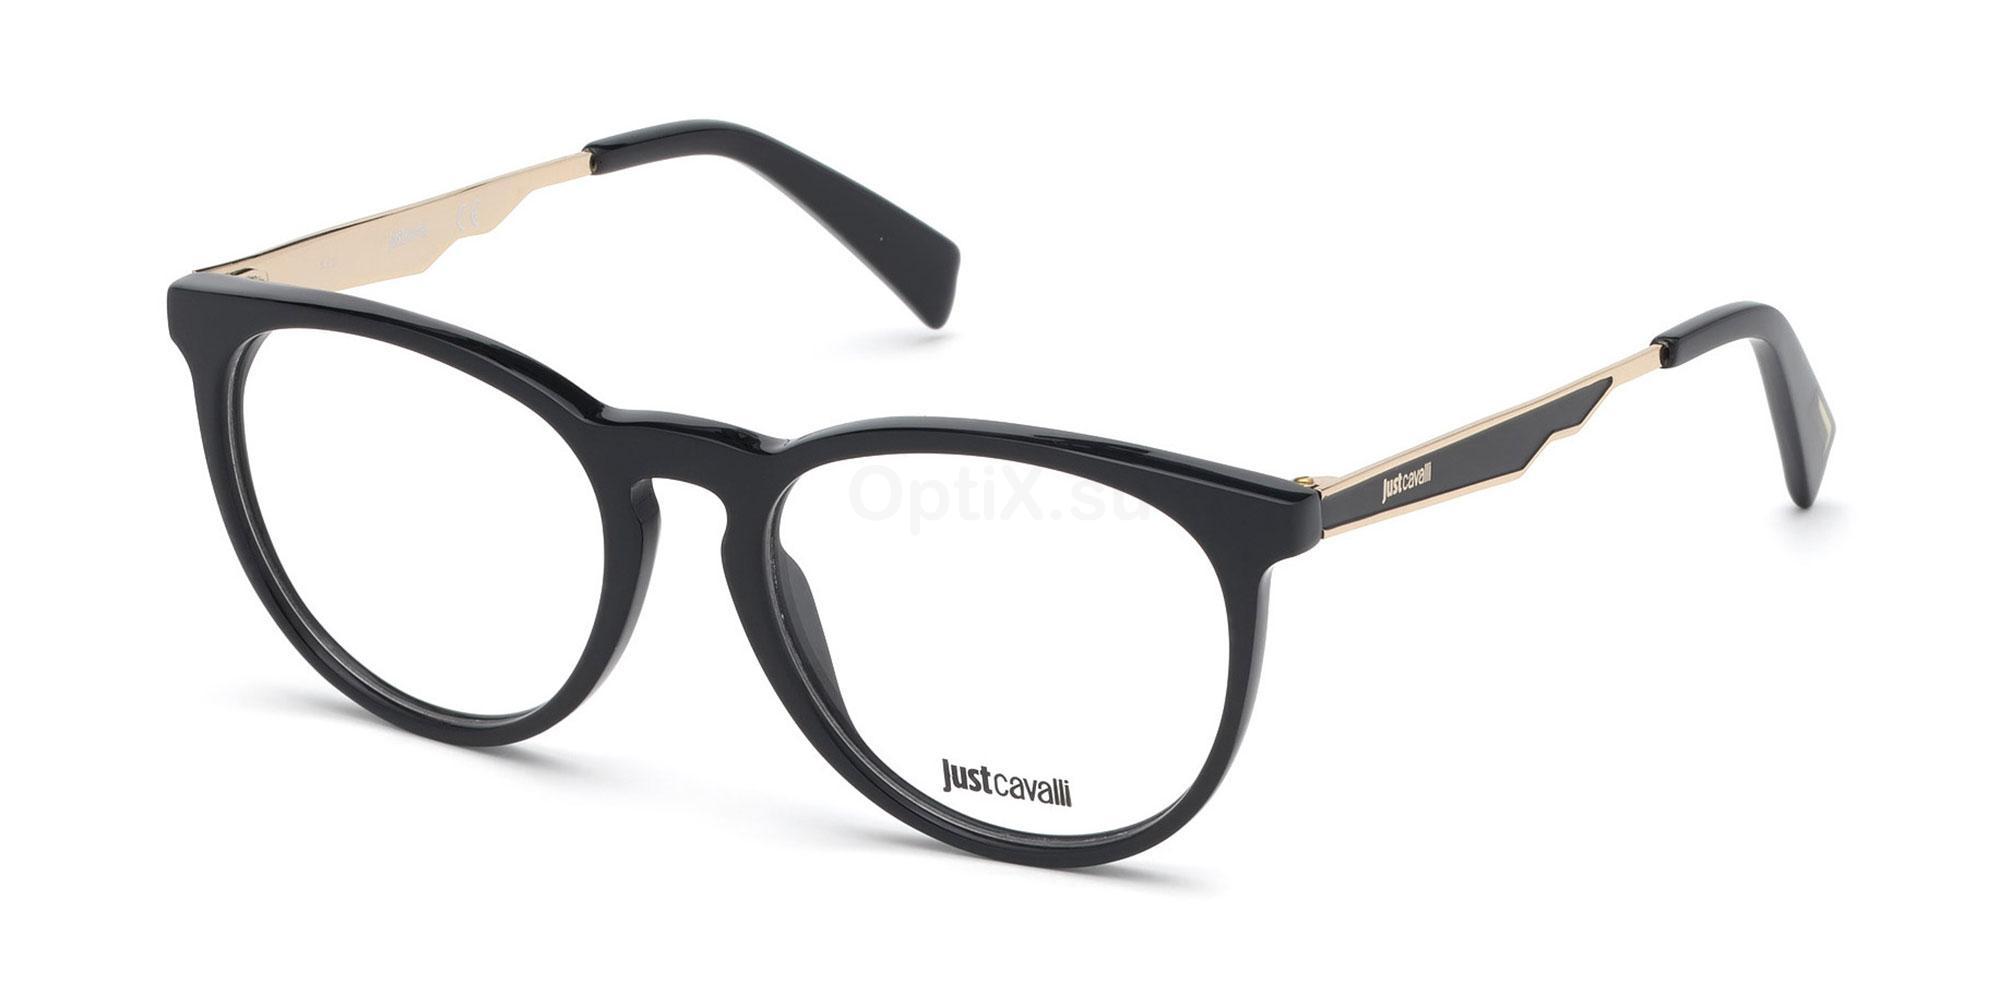 001 JC0879 Glasses, Just Cavalli